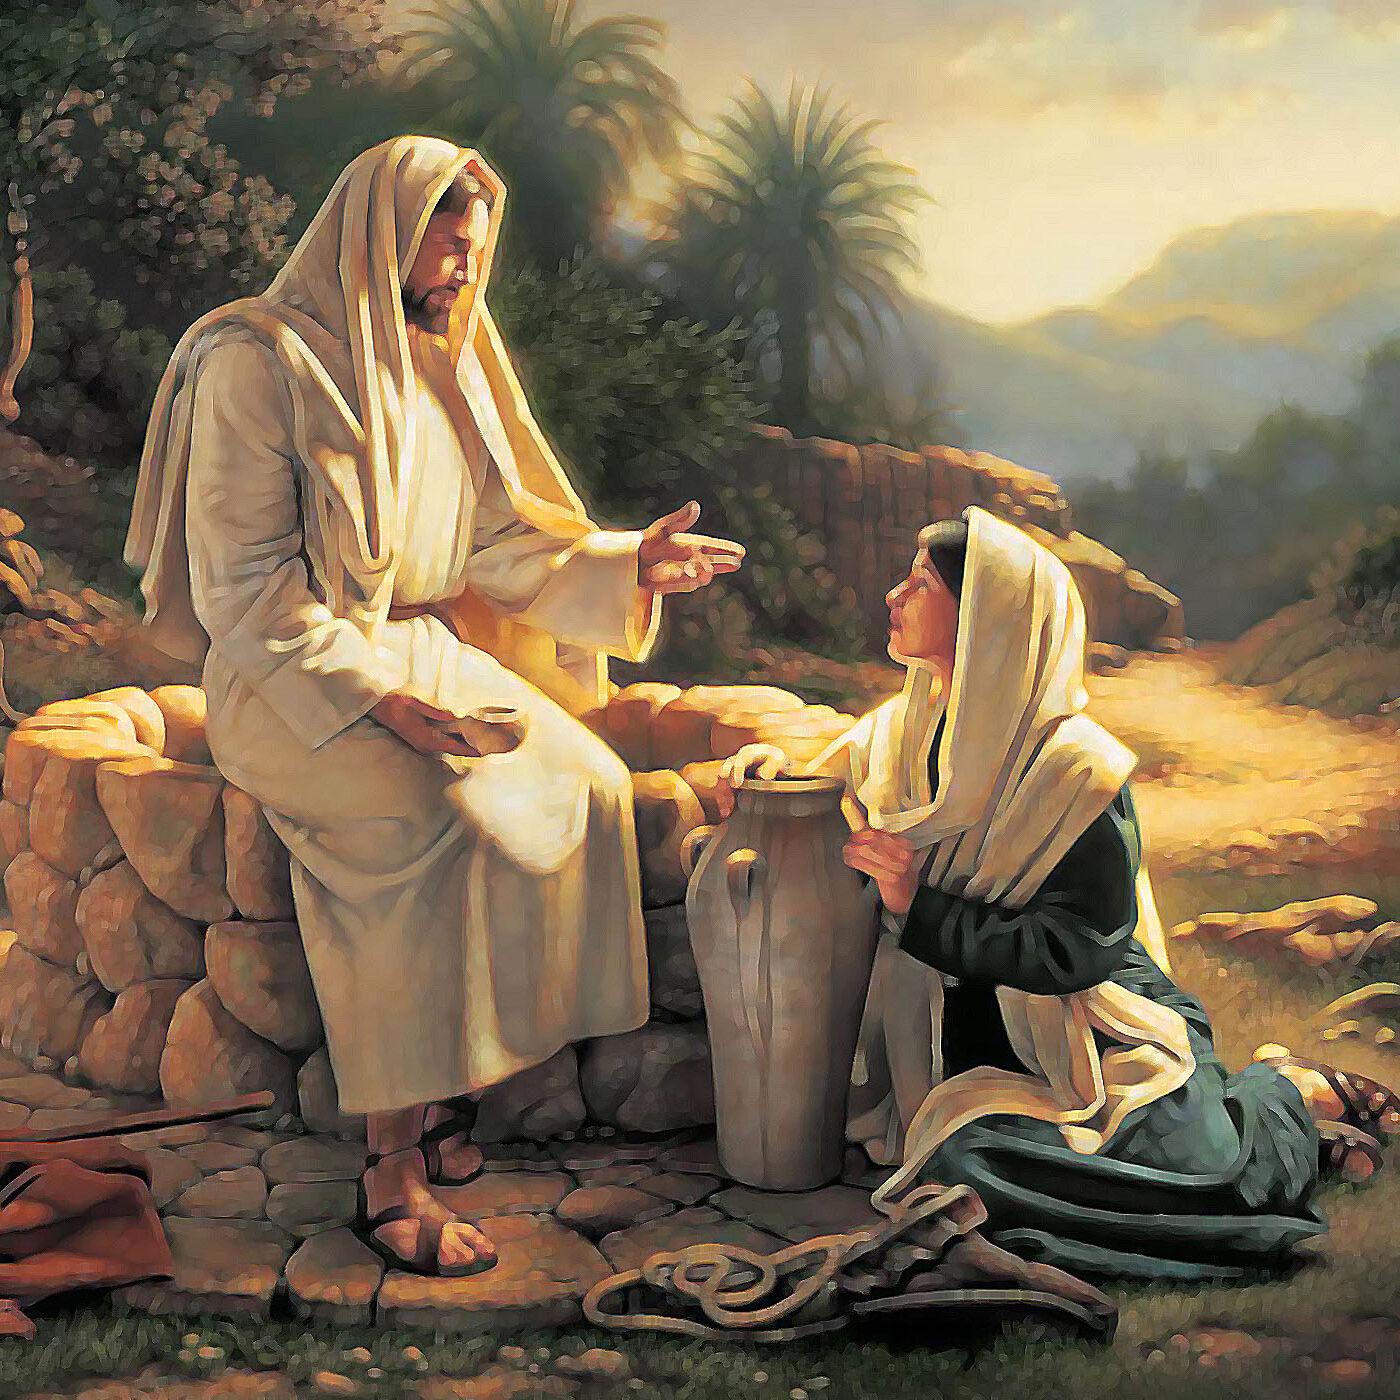 riflessioni sul Vangelo di Martedì 12 Gennaio 2021 (Mc 1, 21-28) - Apostola Alexa